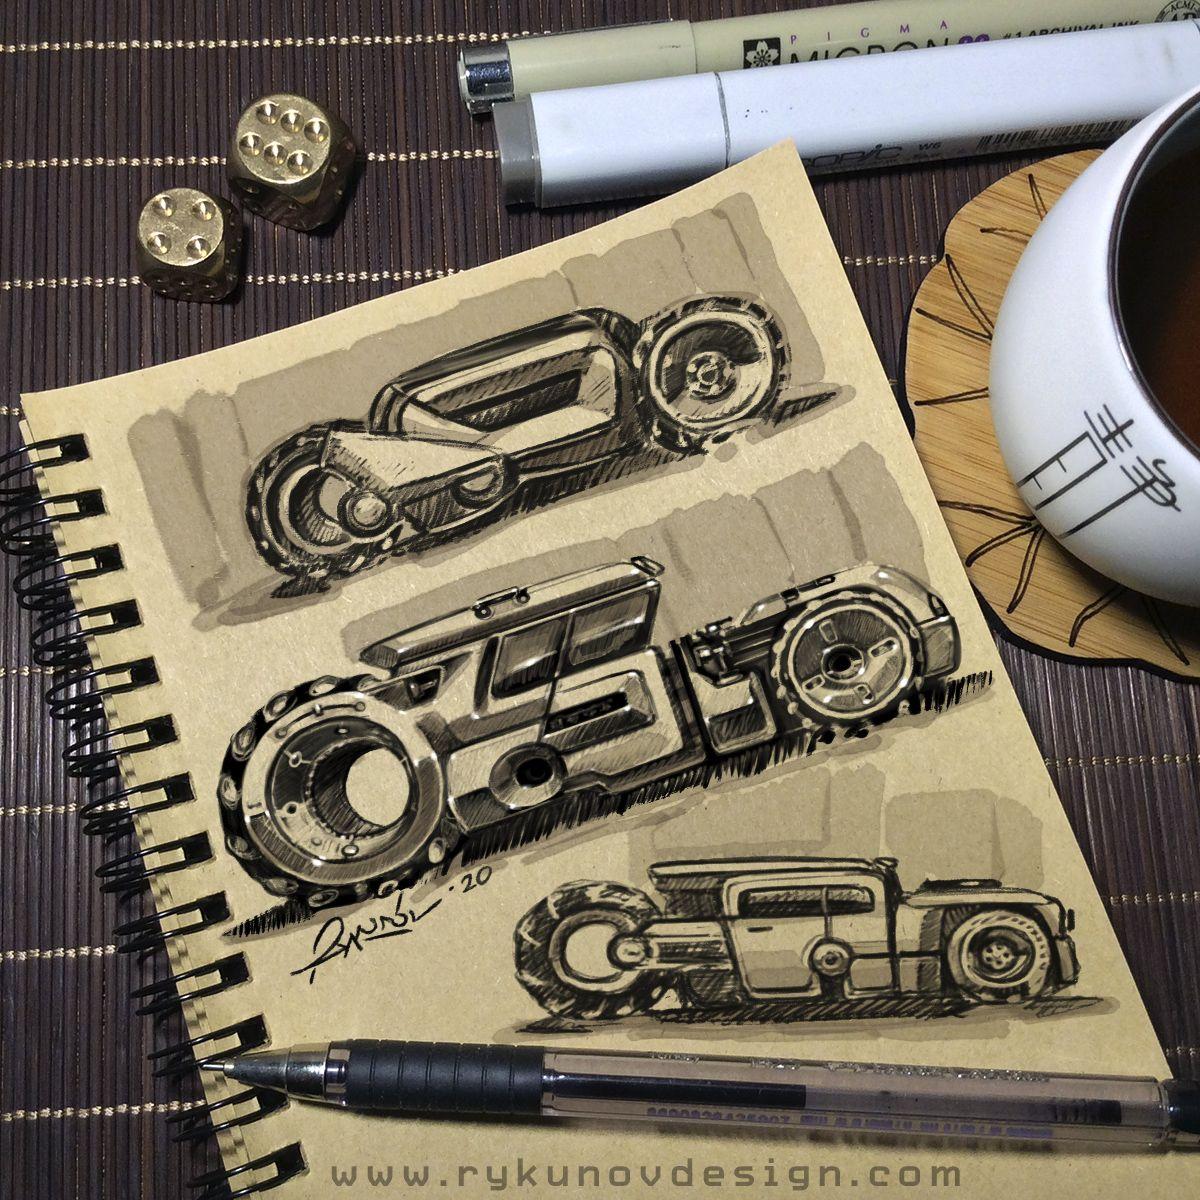 #cardesign #conceptcar #carsketch #carsketching #carsketches #conceptsketch #cardrawing #cardrawings #cardraw #conceptcars #concept #sketchbook #drawtodrive #carartist #carart #automotiveart #rykunovdesign #скетчбук #автодизайн #рисунокавто #дизайнавто #скетчинг